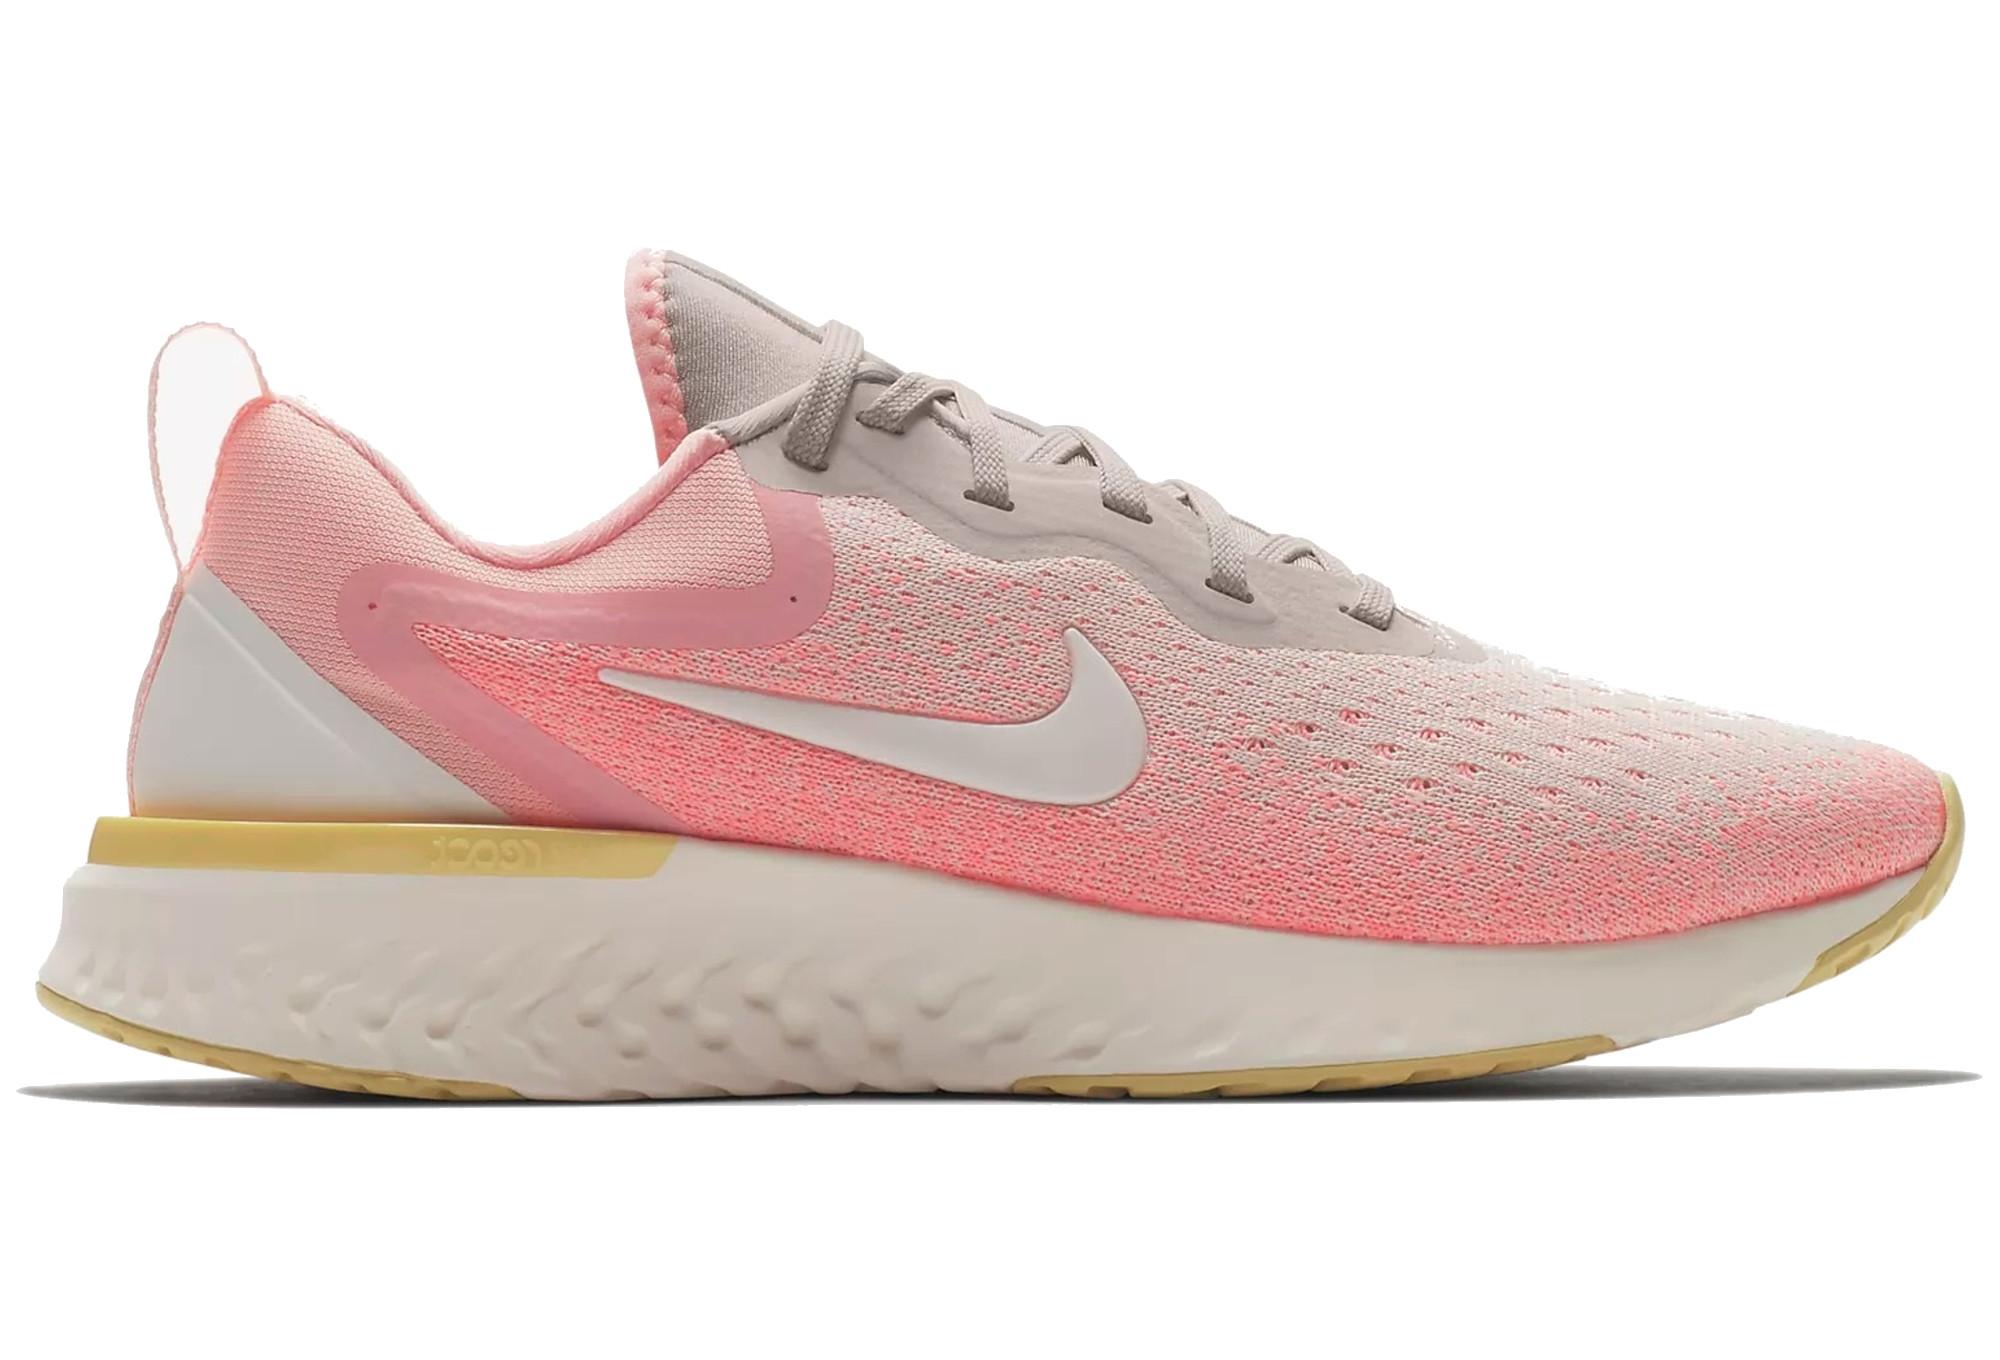 nouveau style 4c26f 4453f Nike Shoes Odyssey React Grey Pink Women